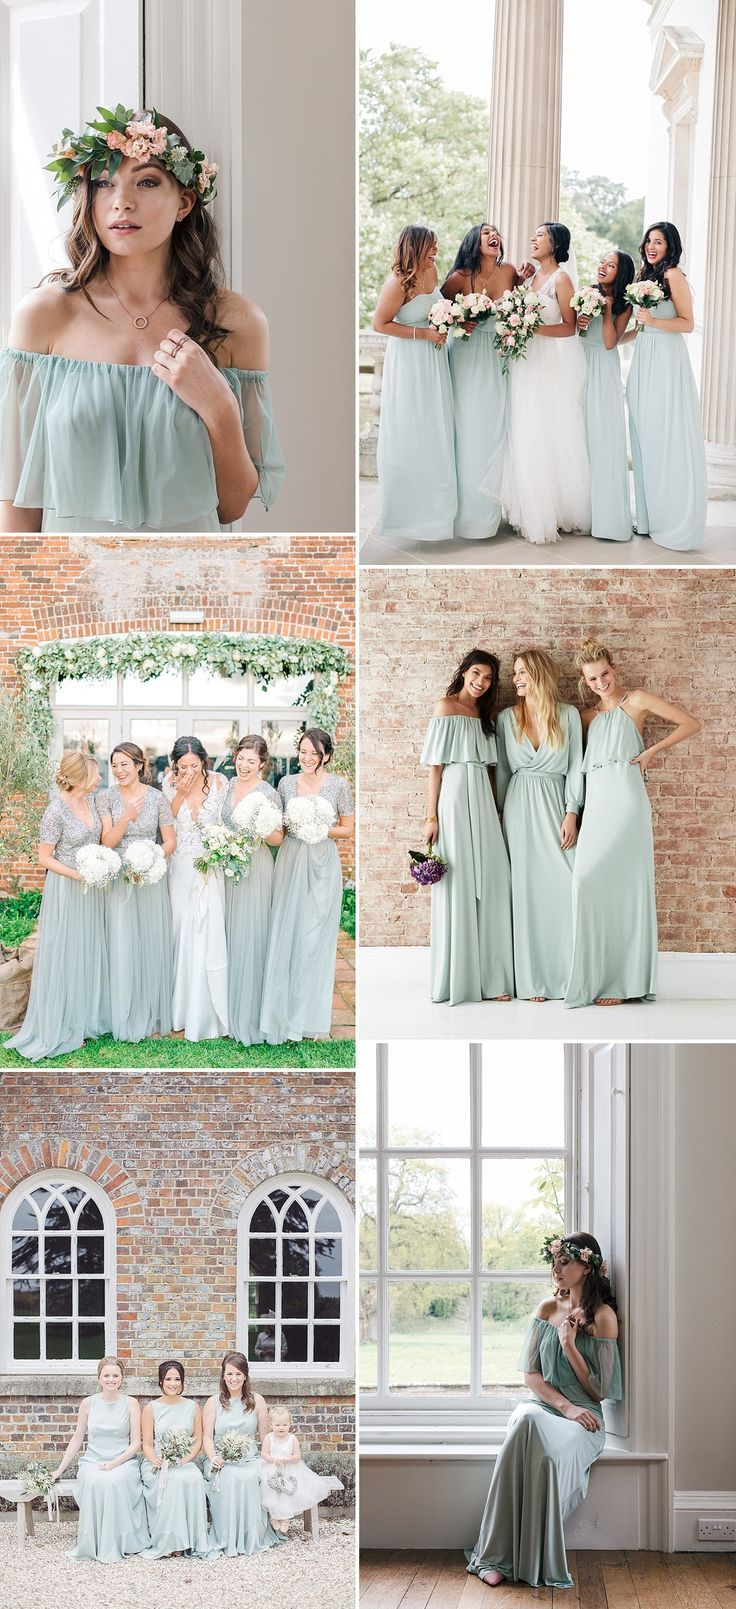 12 best Bridesmaids Ideas images on Pinterest   Bridesmaids, Flower ...